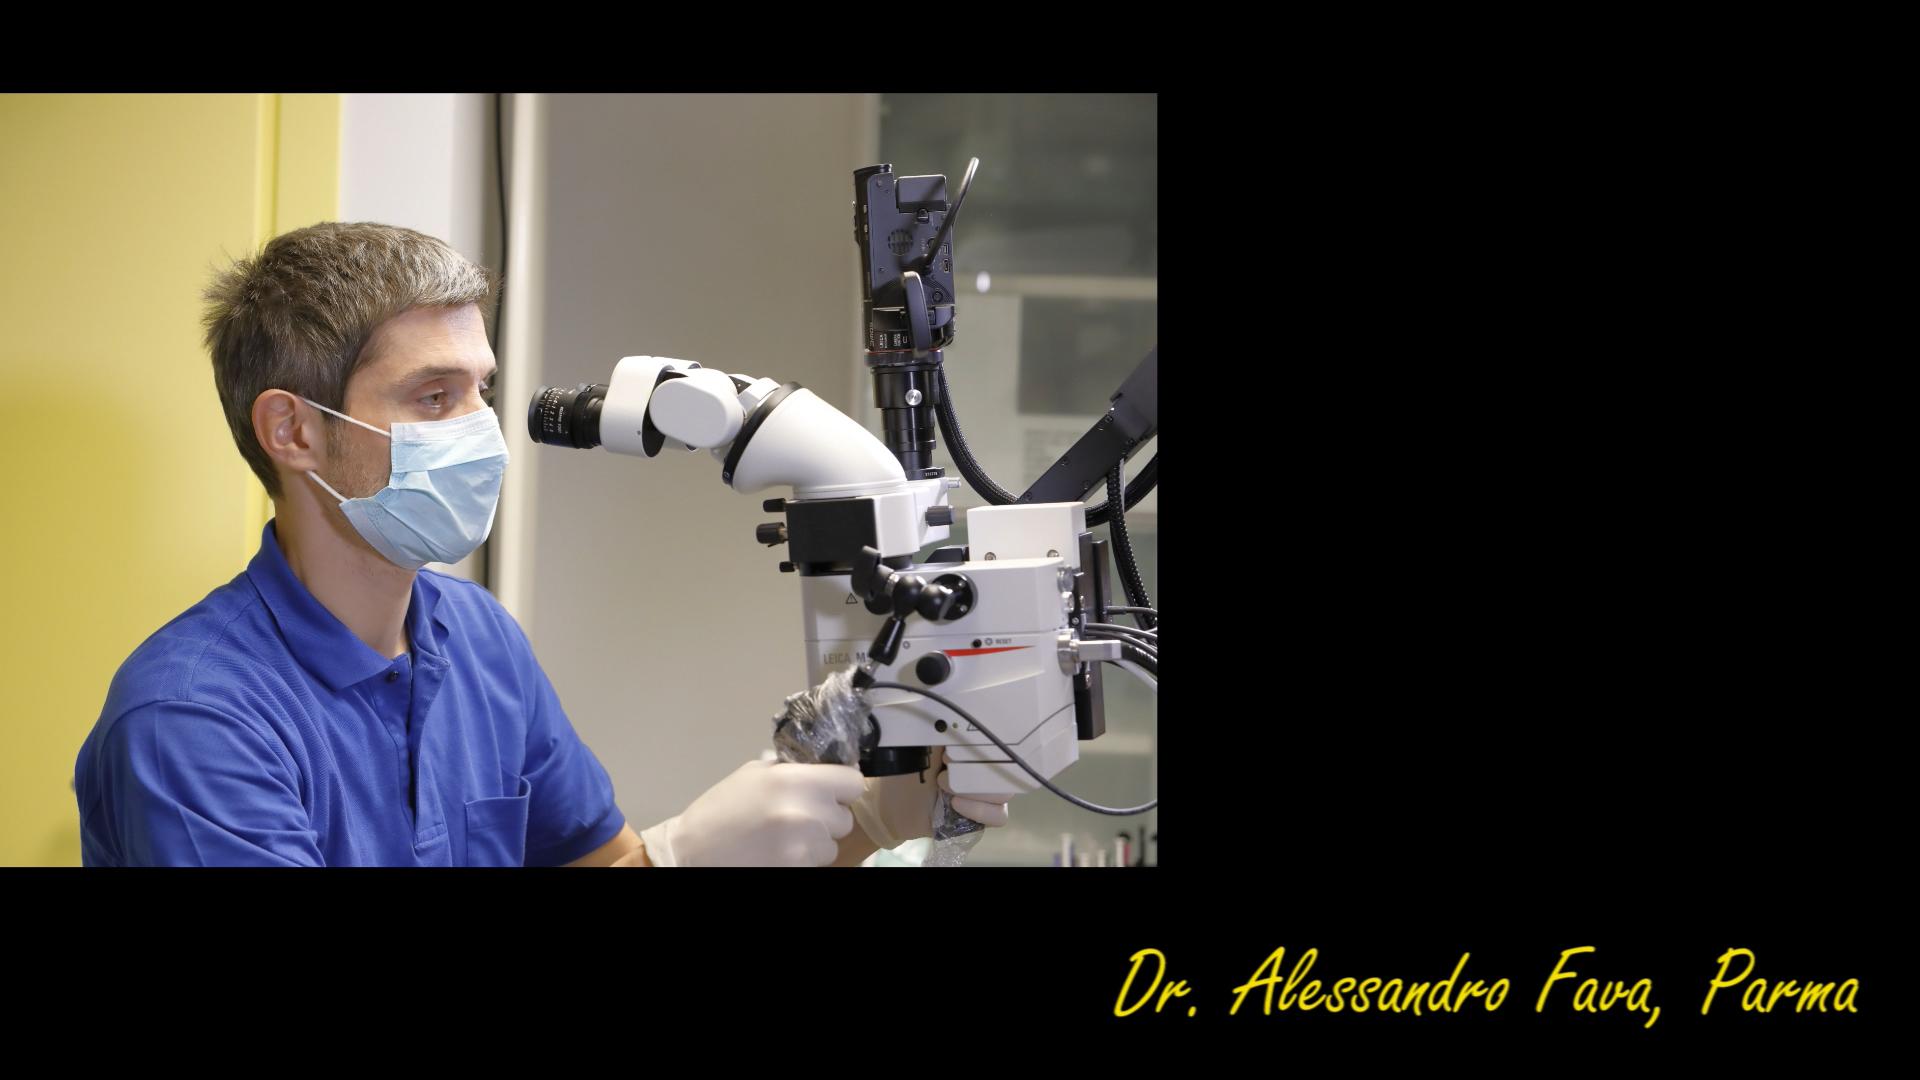 Dott Alessandro Fava